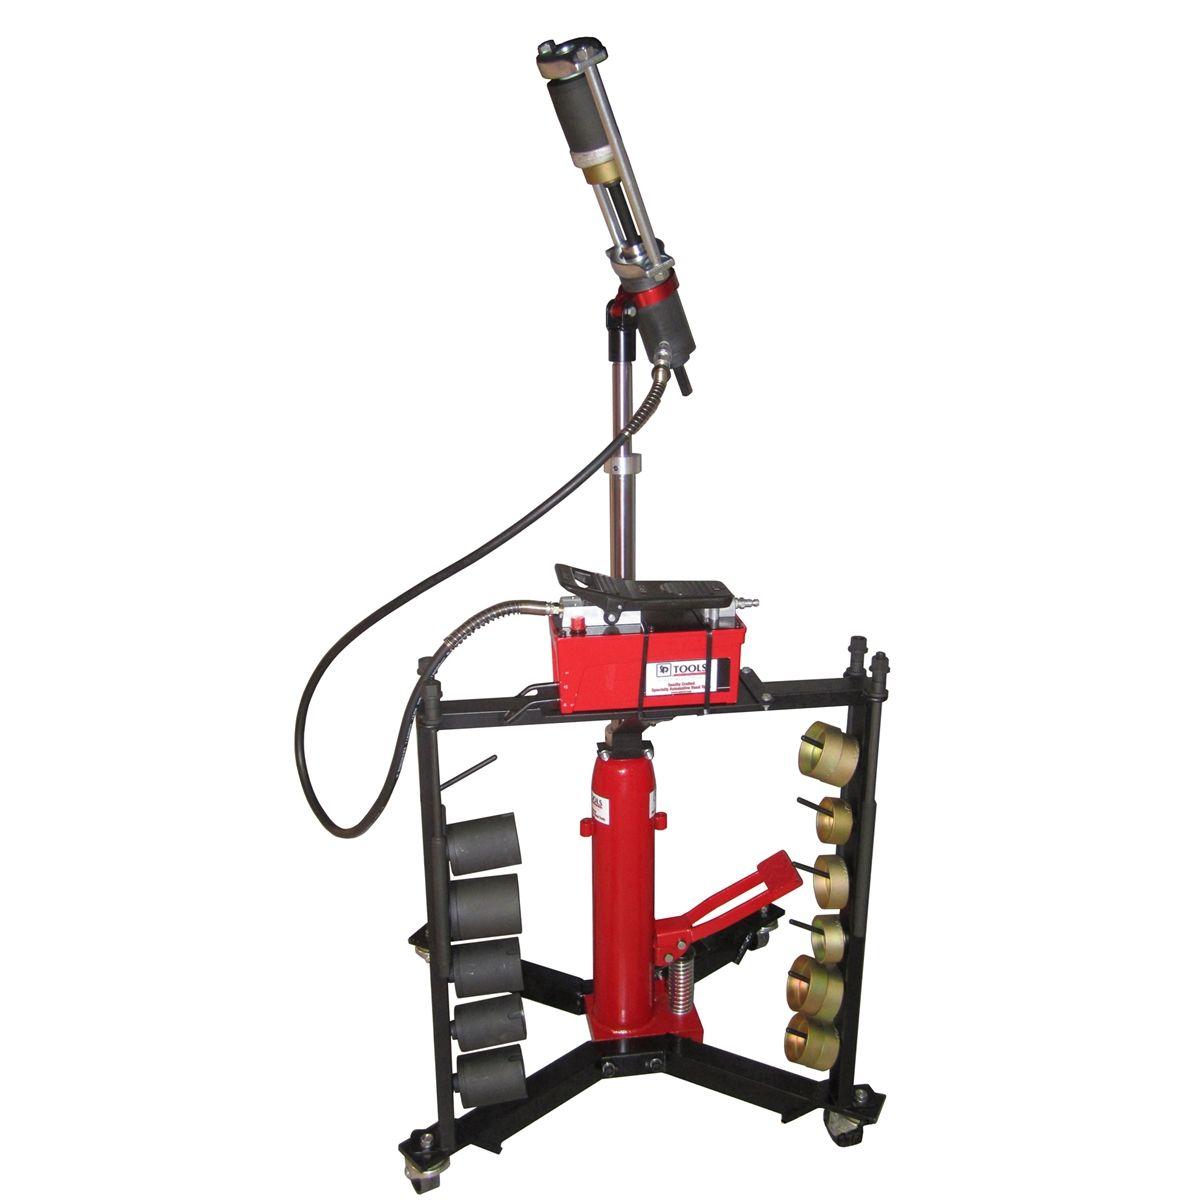 Hand Hydraulic Press ~ Mobile hydraulic press tool w hand pump schley products